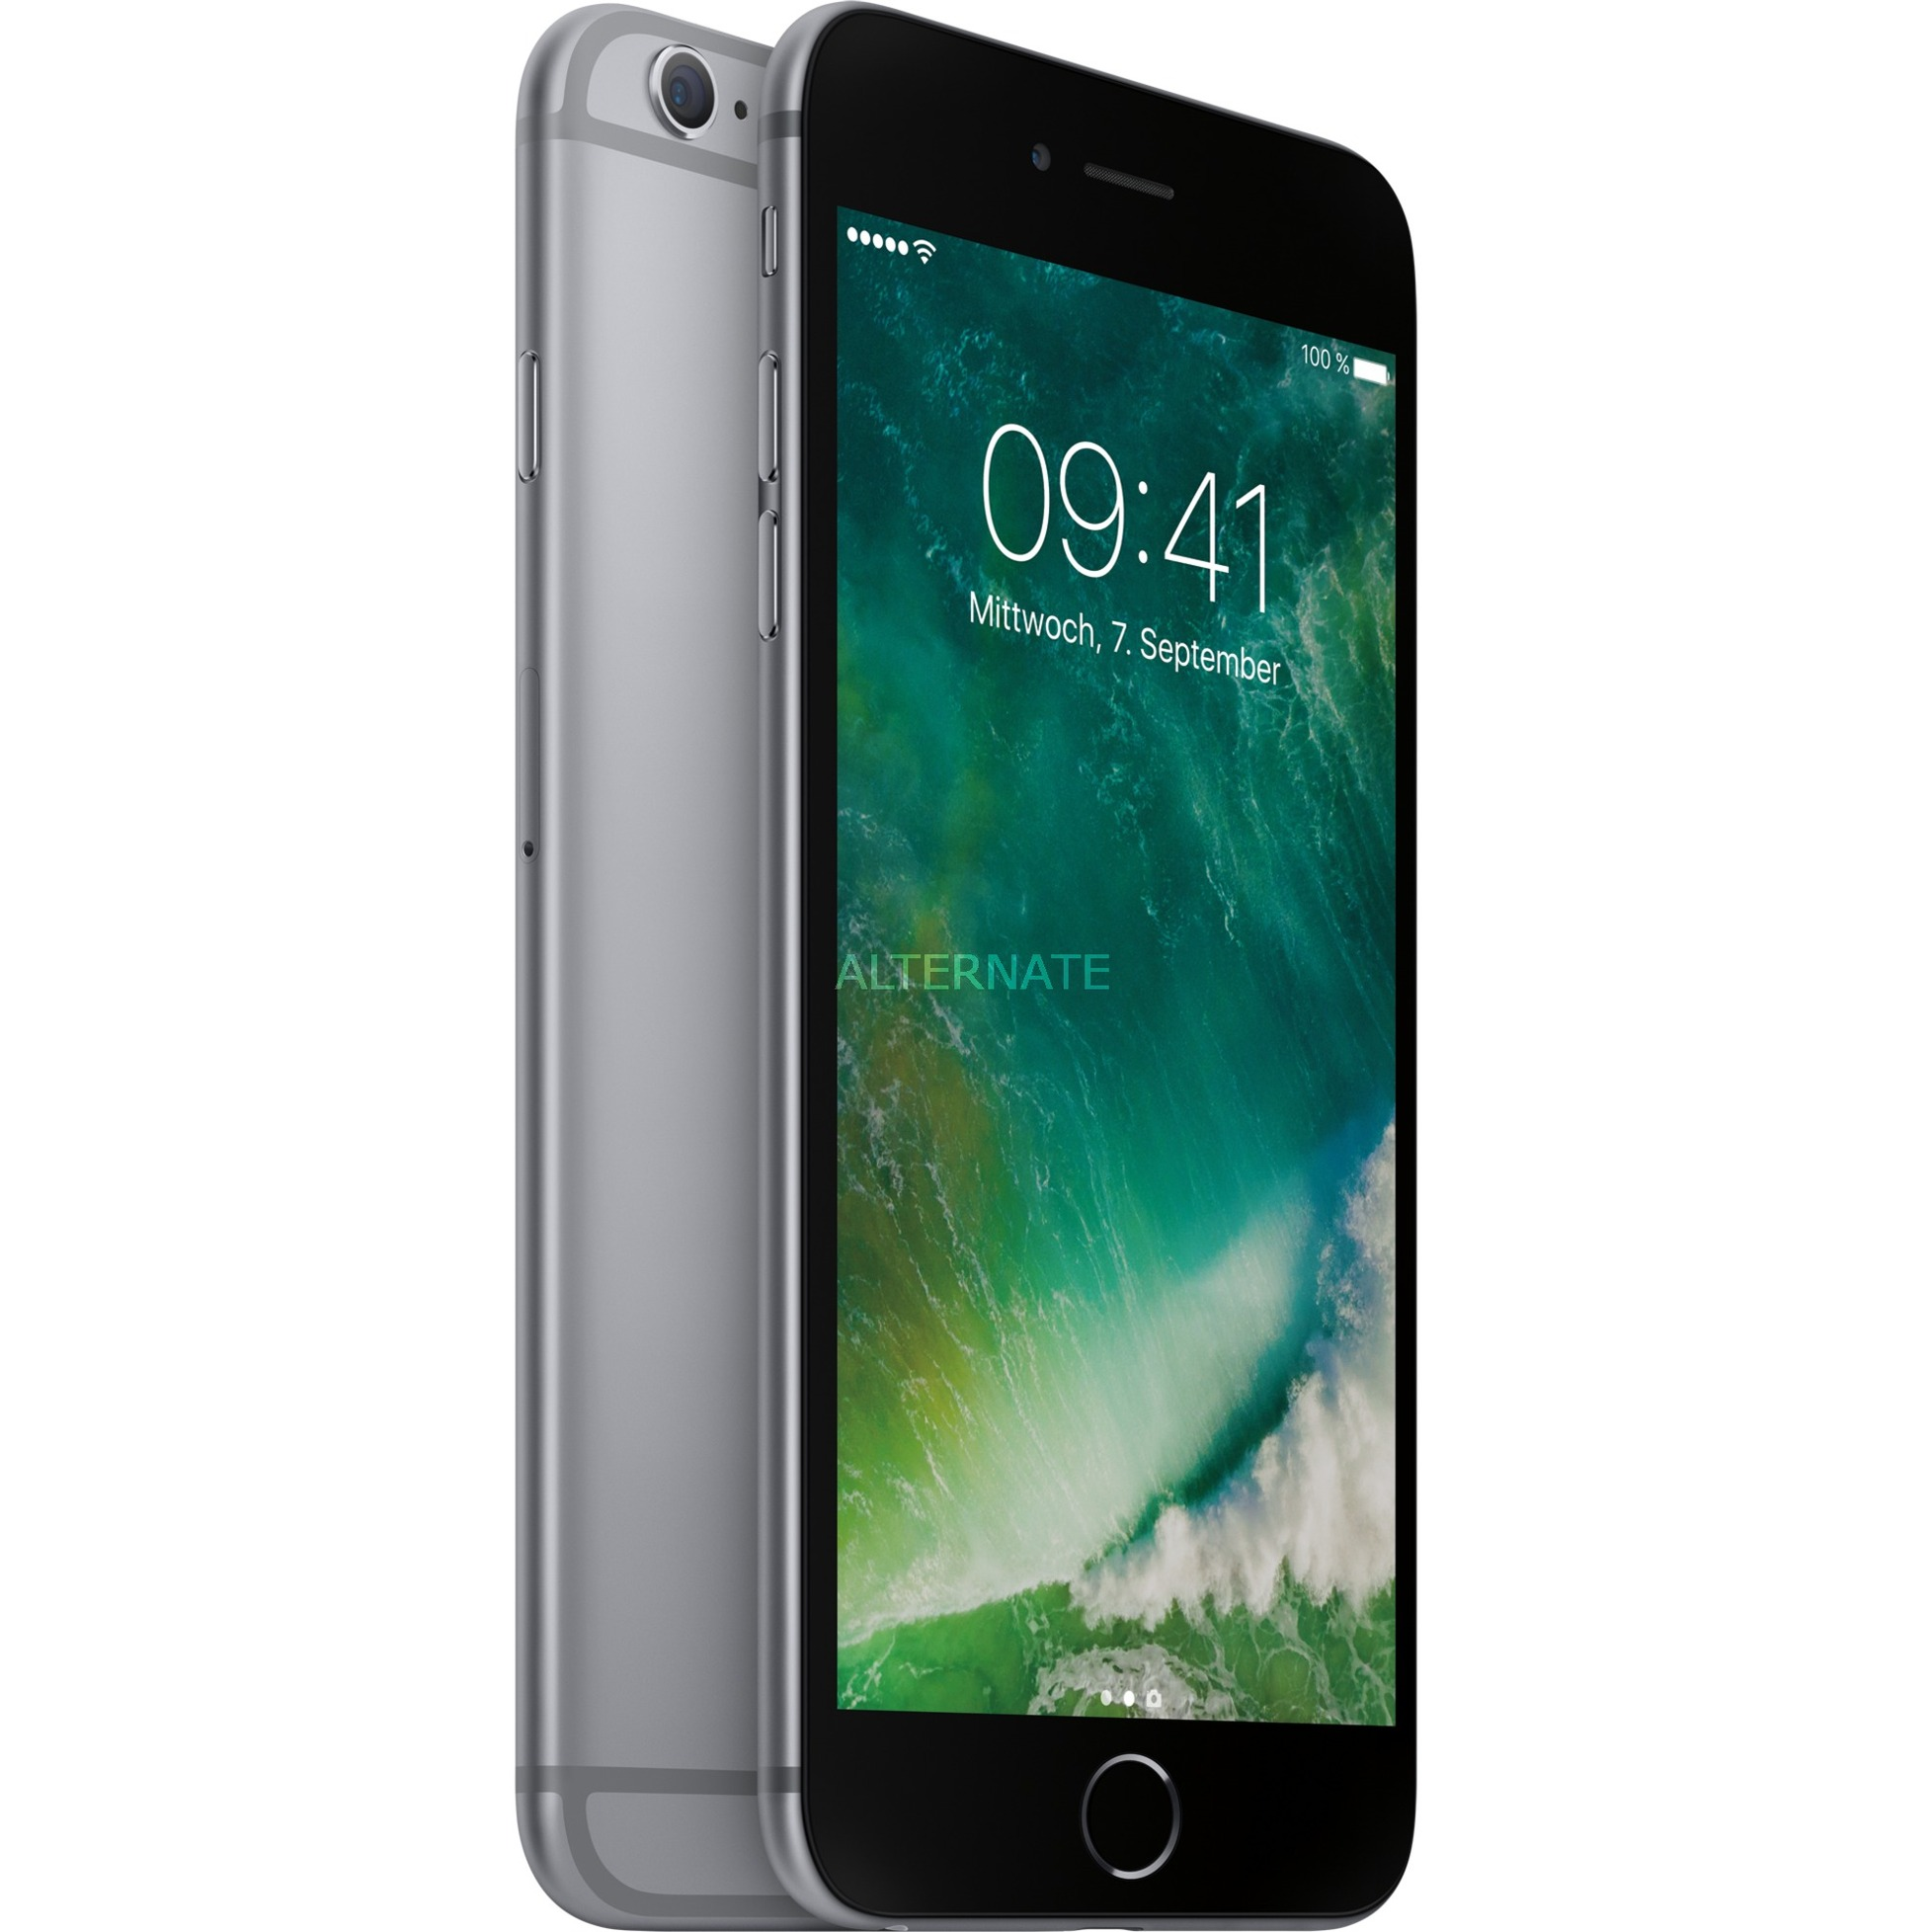 IPhone 6s Plus 32GB, Mobiltelefon